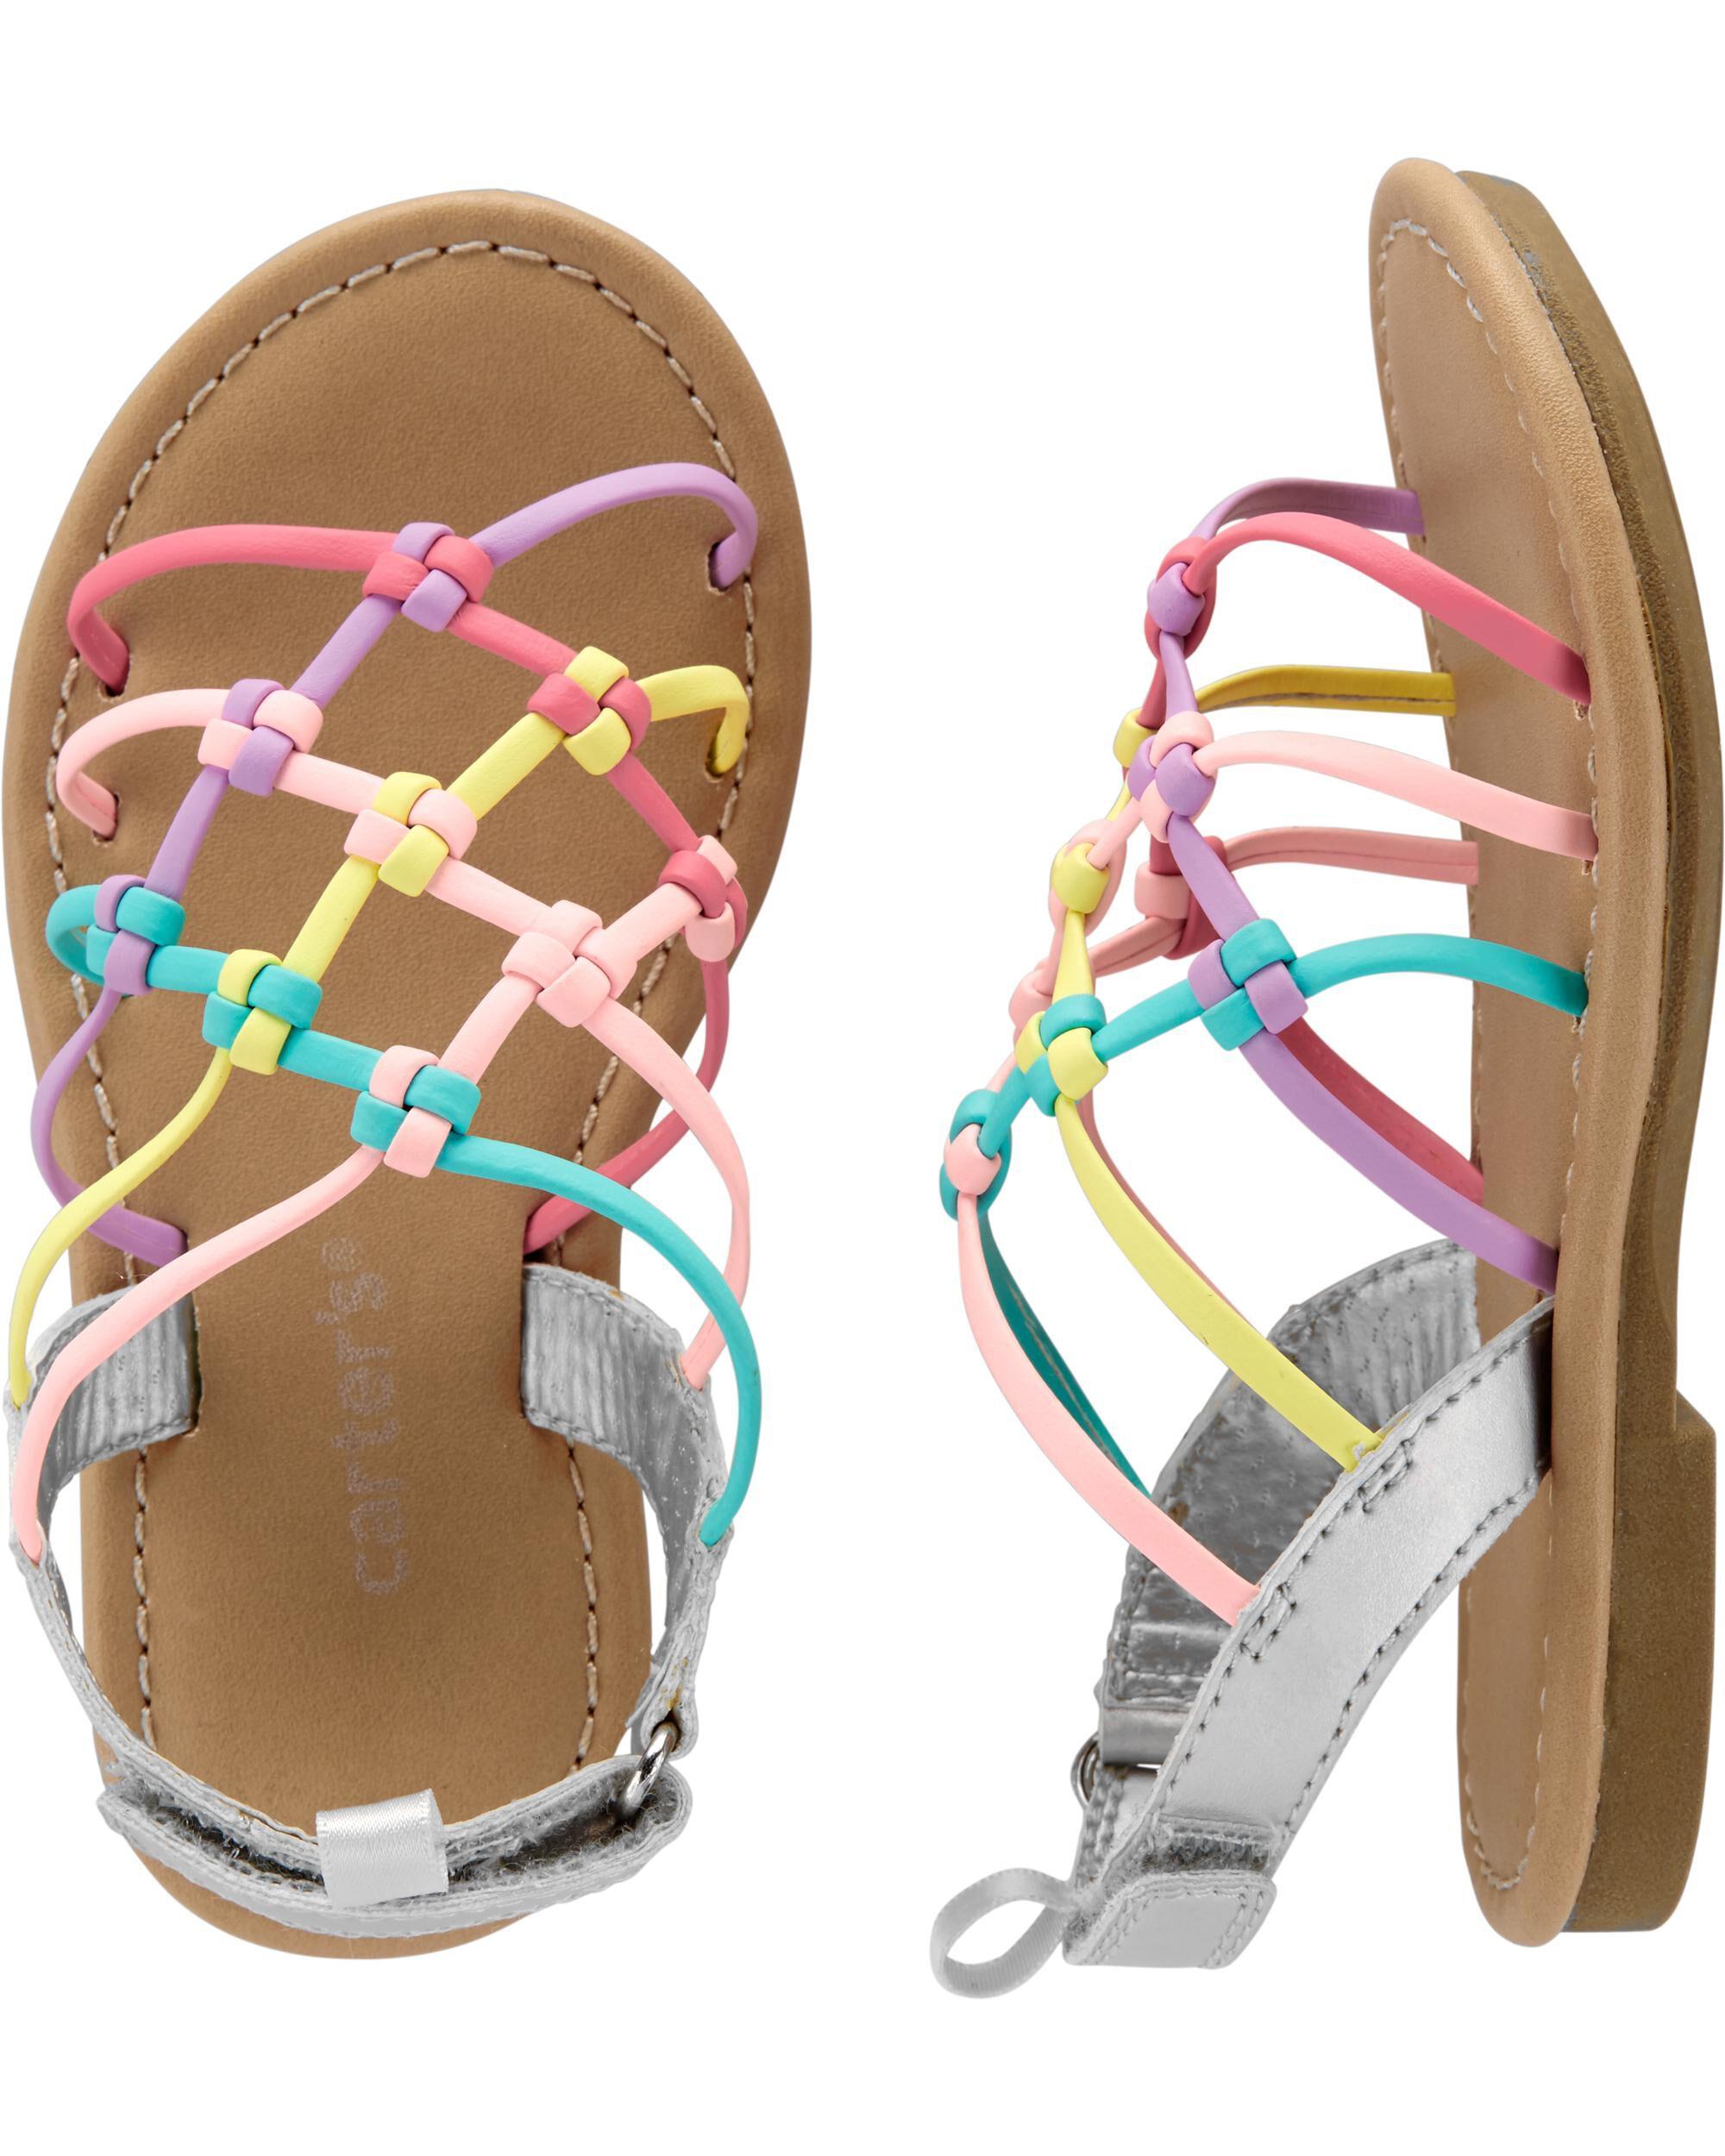 Carter's Rainbow Sandals | carters.com